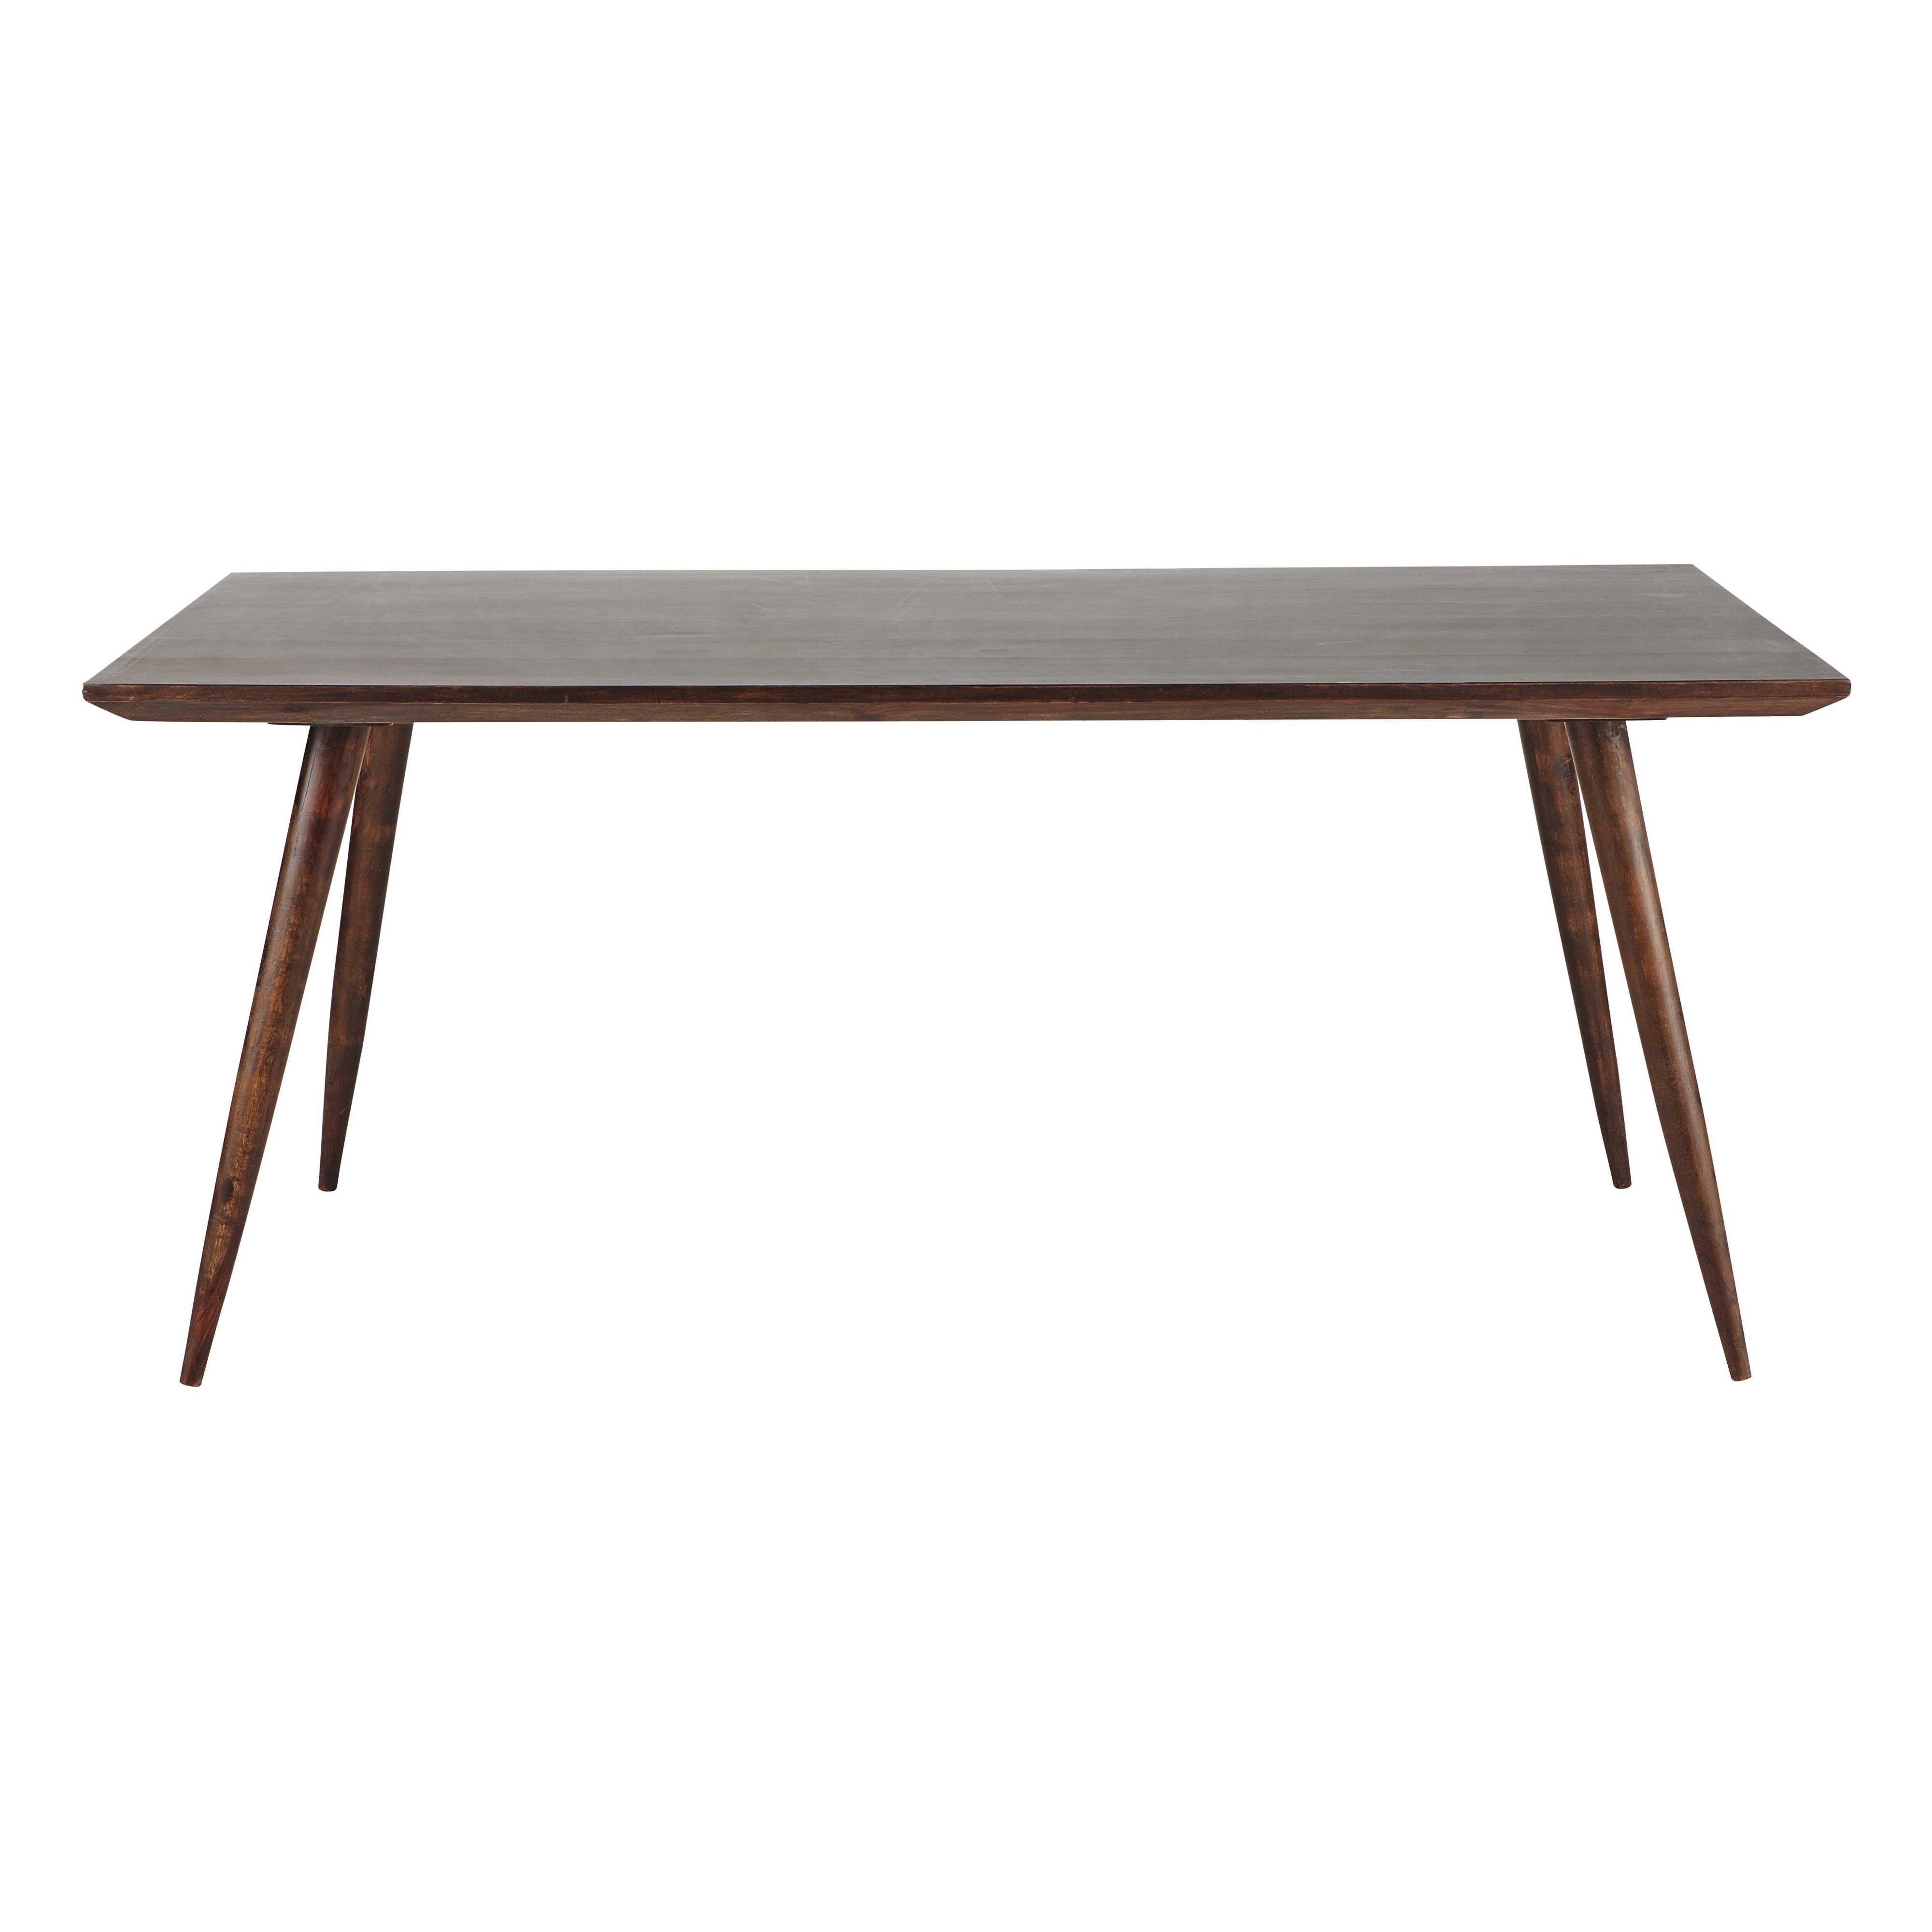 Table de salle  manger en bois de sheesham massif brun L 175 cm